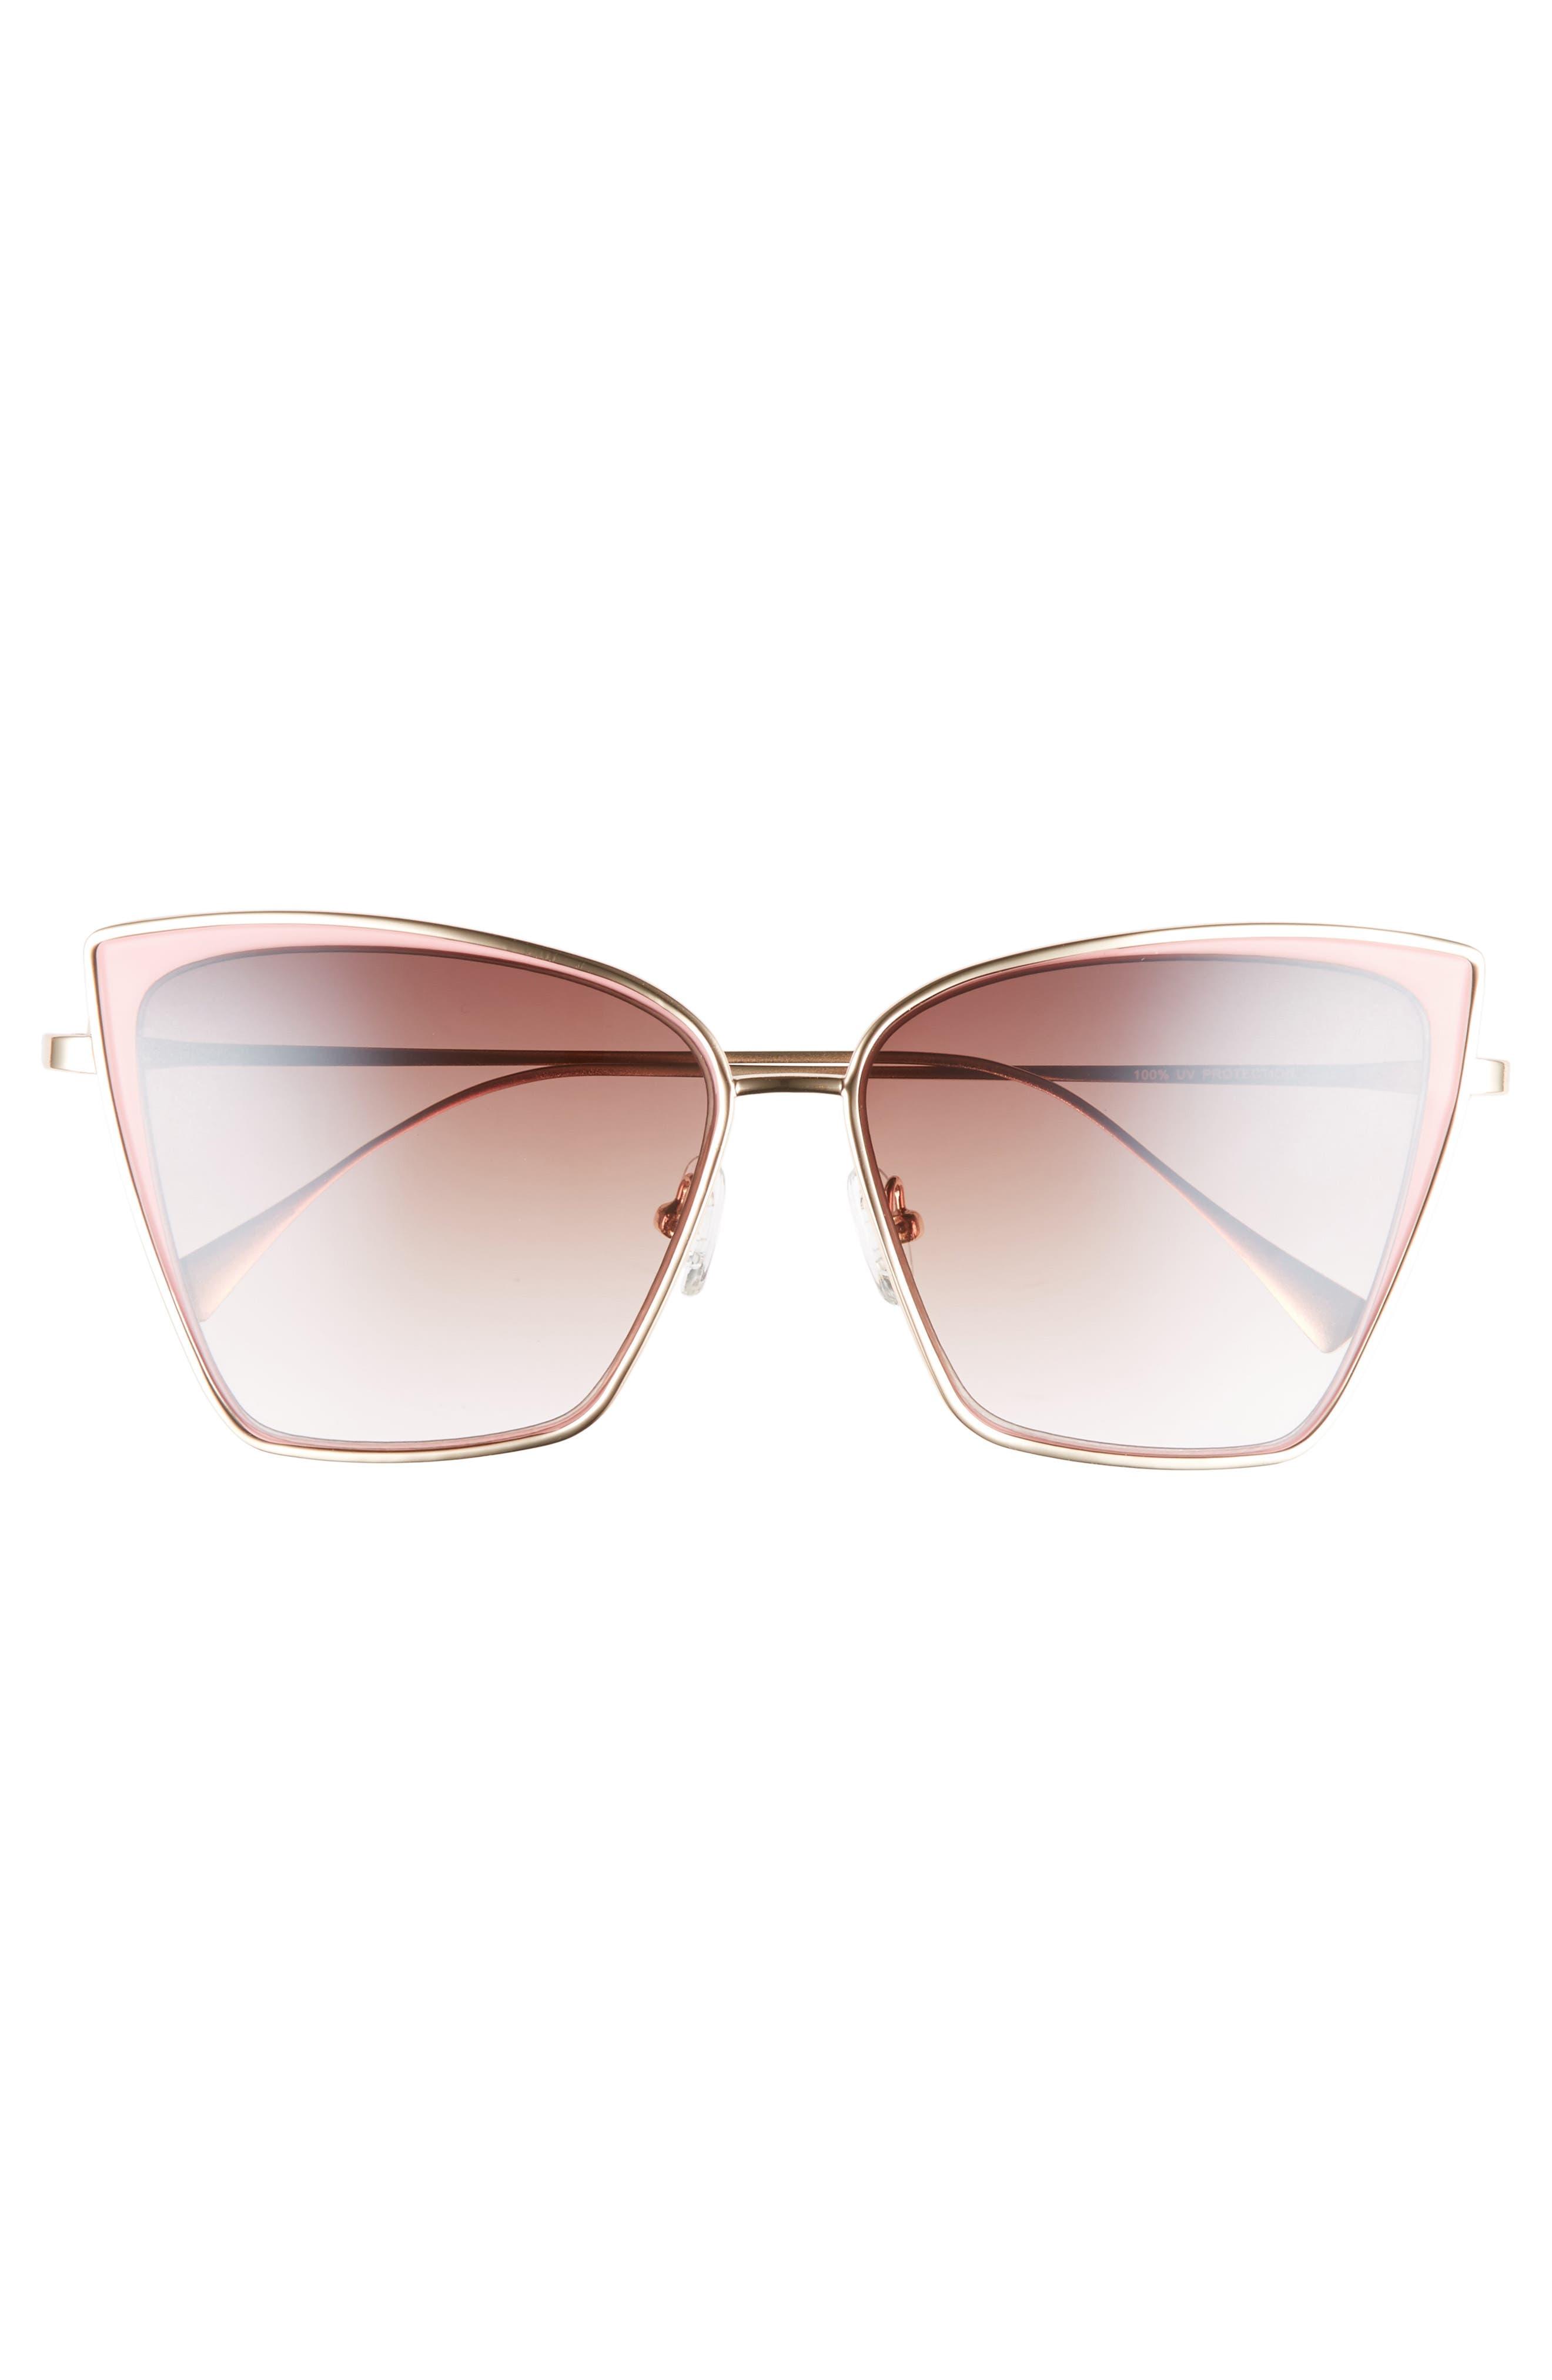 Pinkaboo 58mm Sunglasses,                             Alternate thumbnail 3, color,                             650